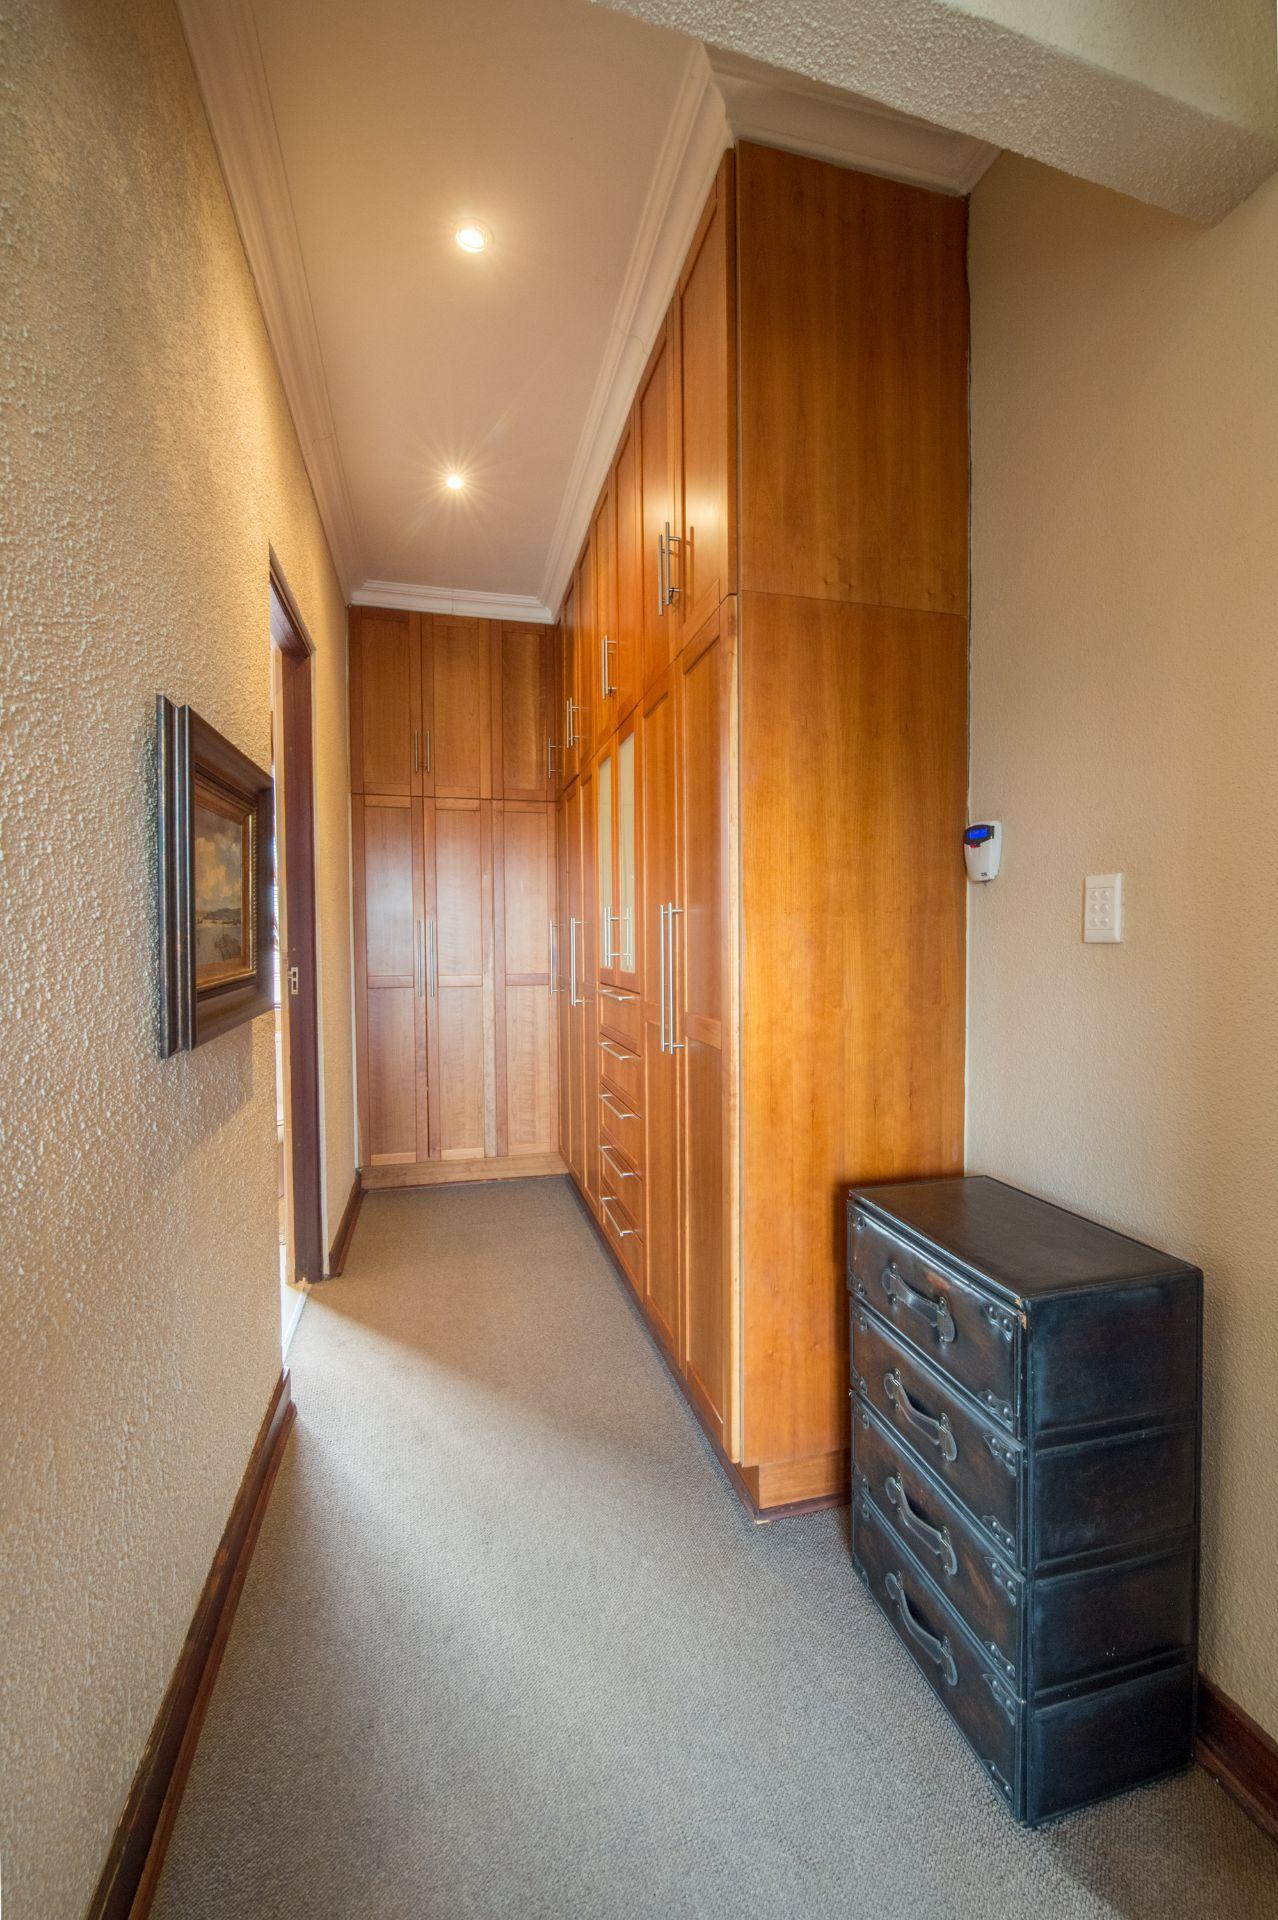 Baillie Park property for sale. Ref No: 13588231. Picture no 21